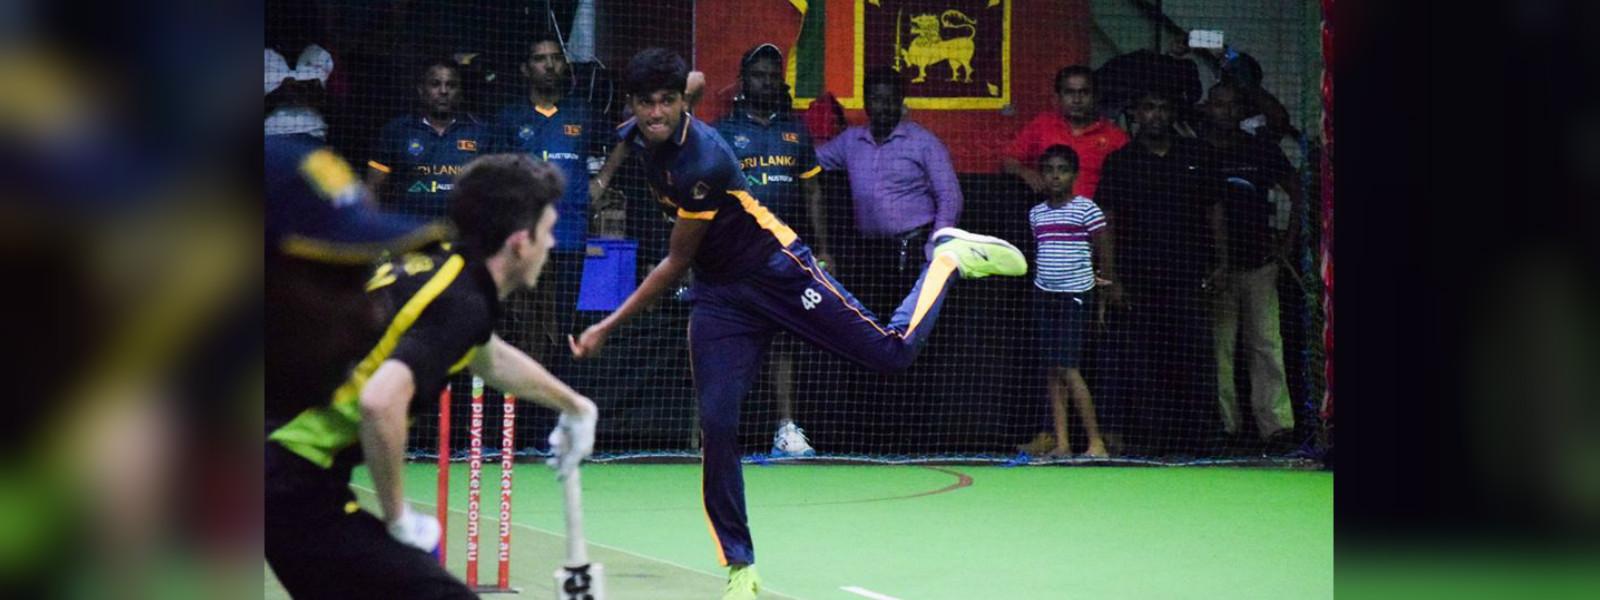 2 more wins for Sri Lanka in England